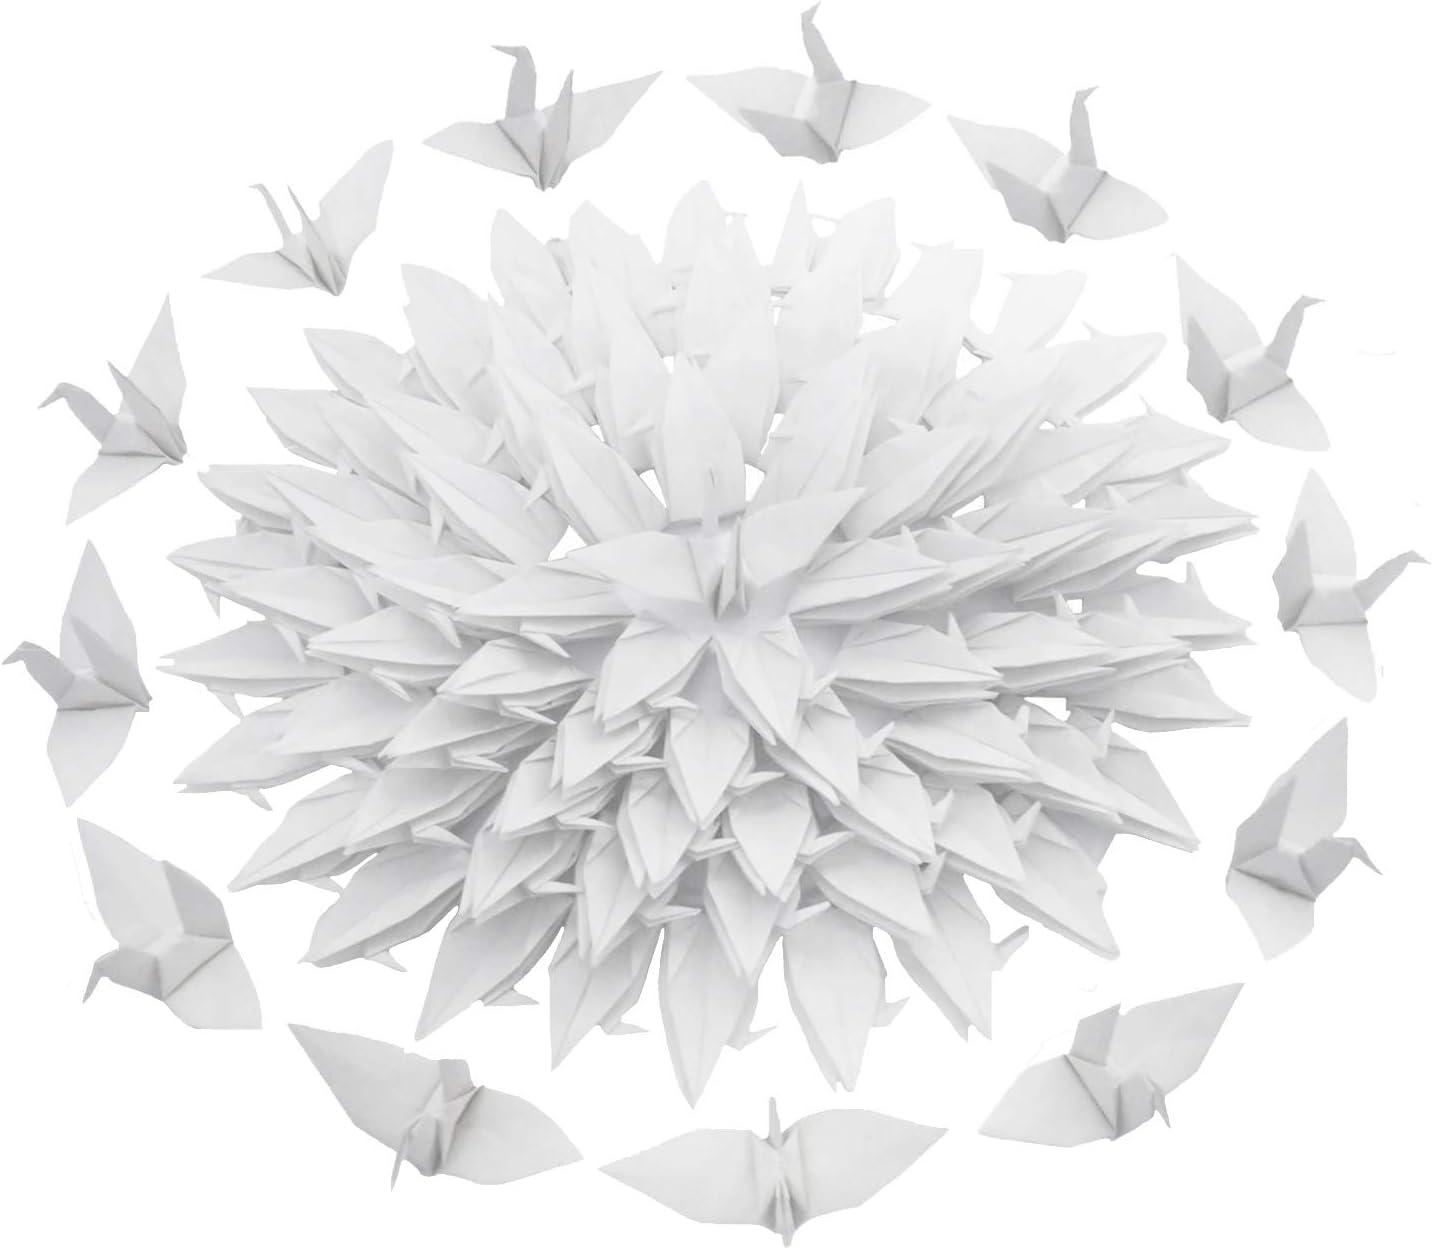 Kingsnow 100 PCS White Origami Hand-Made Long Ultra-Cheap Deals Beach Mall Folded Paper DIY Crane